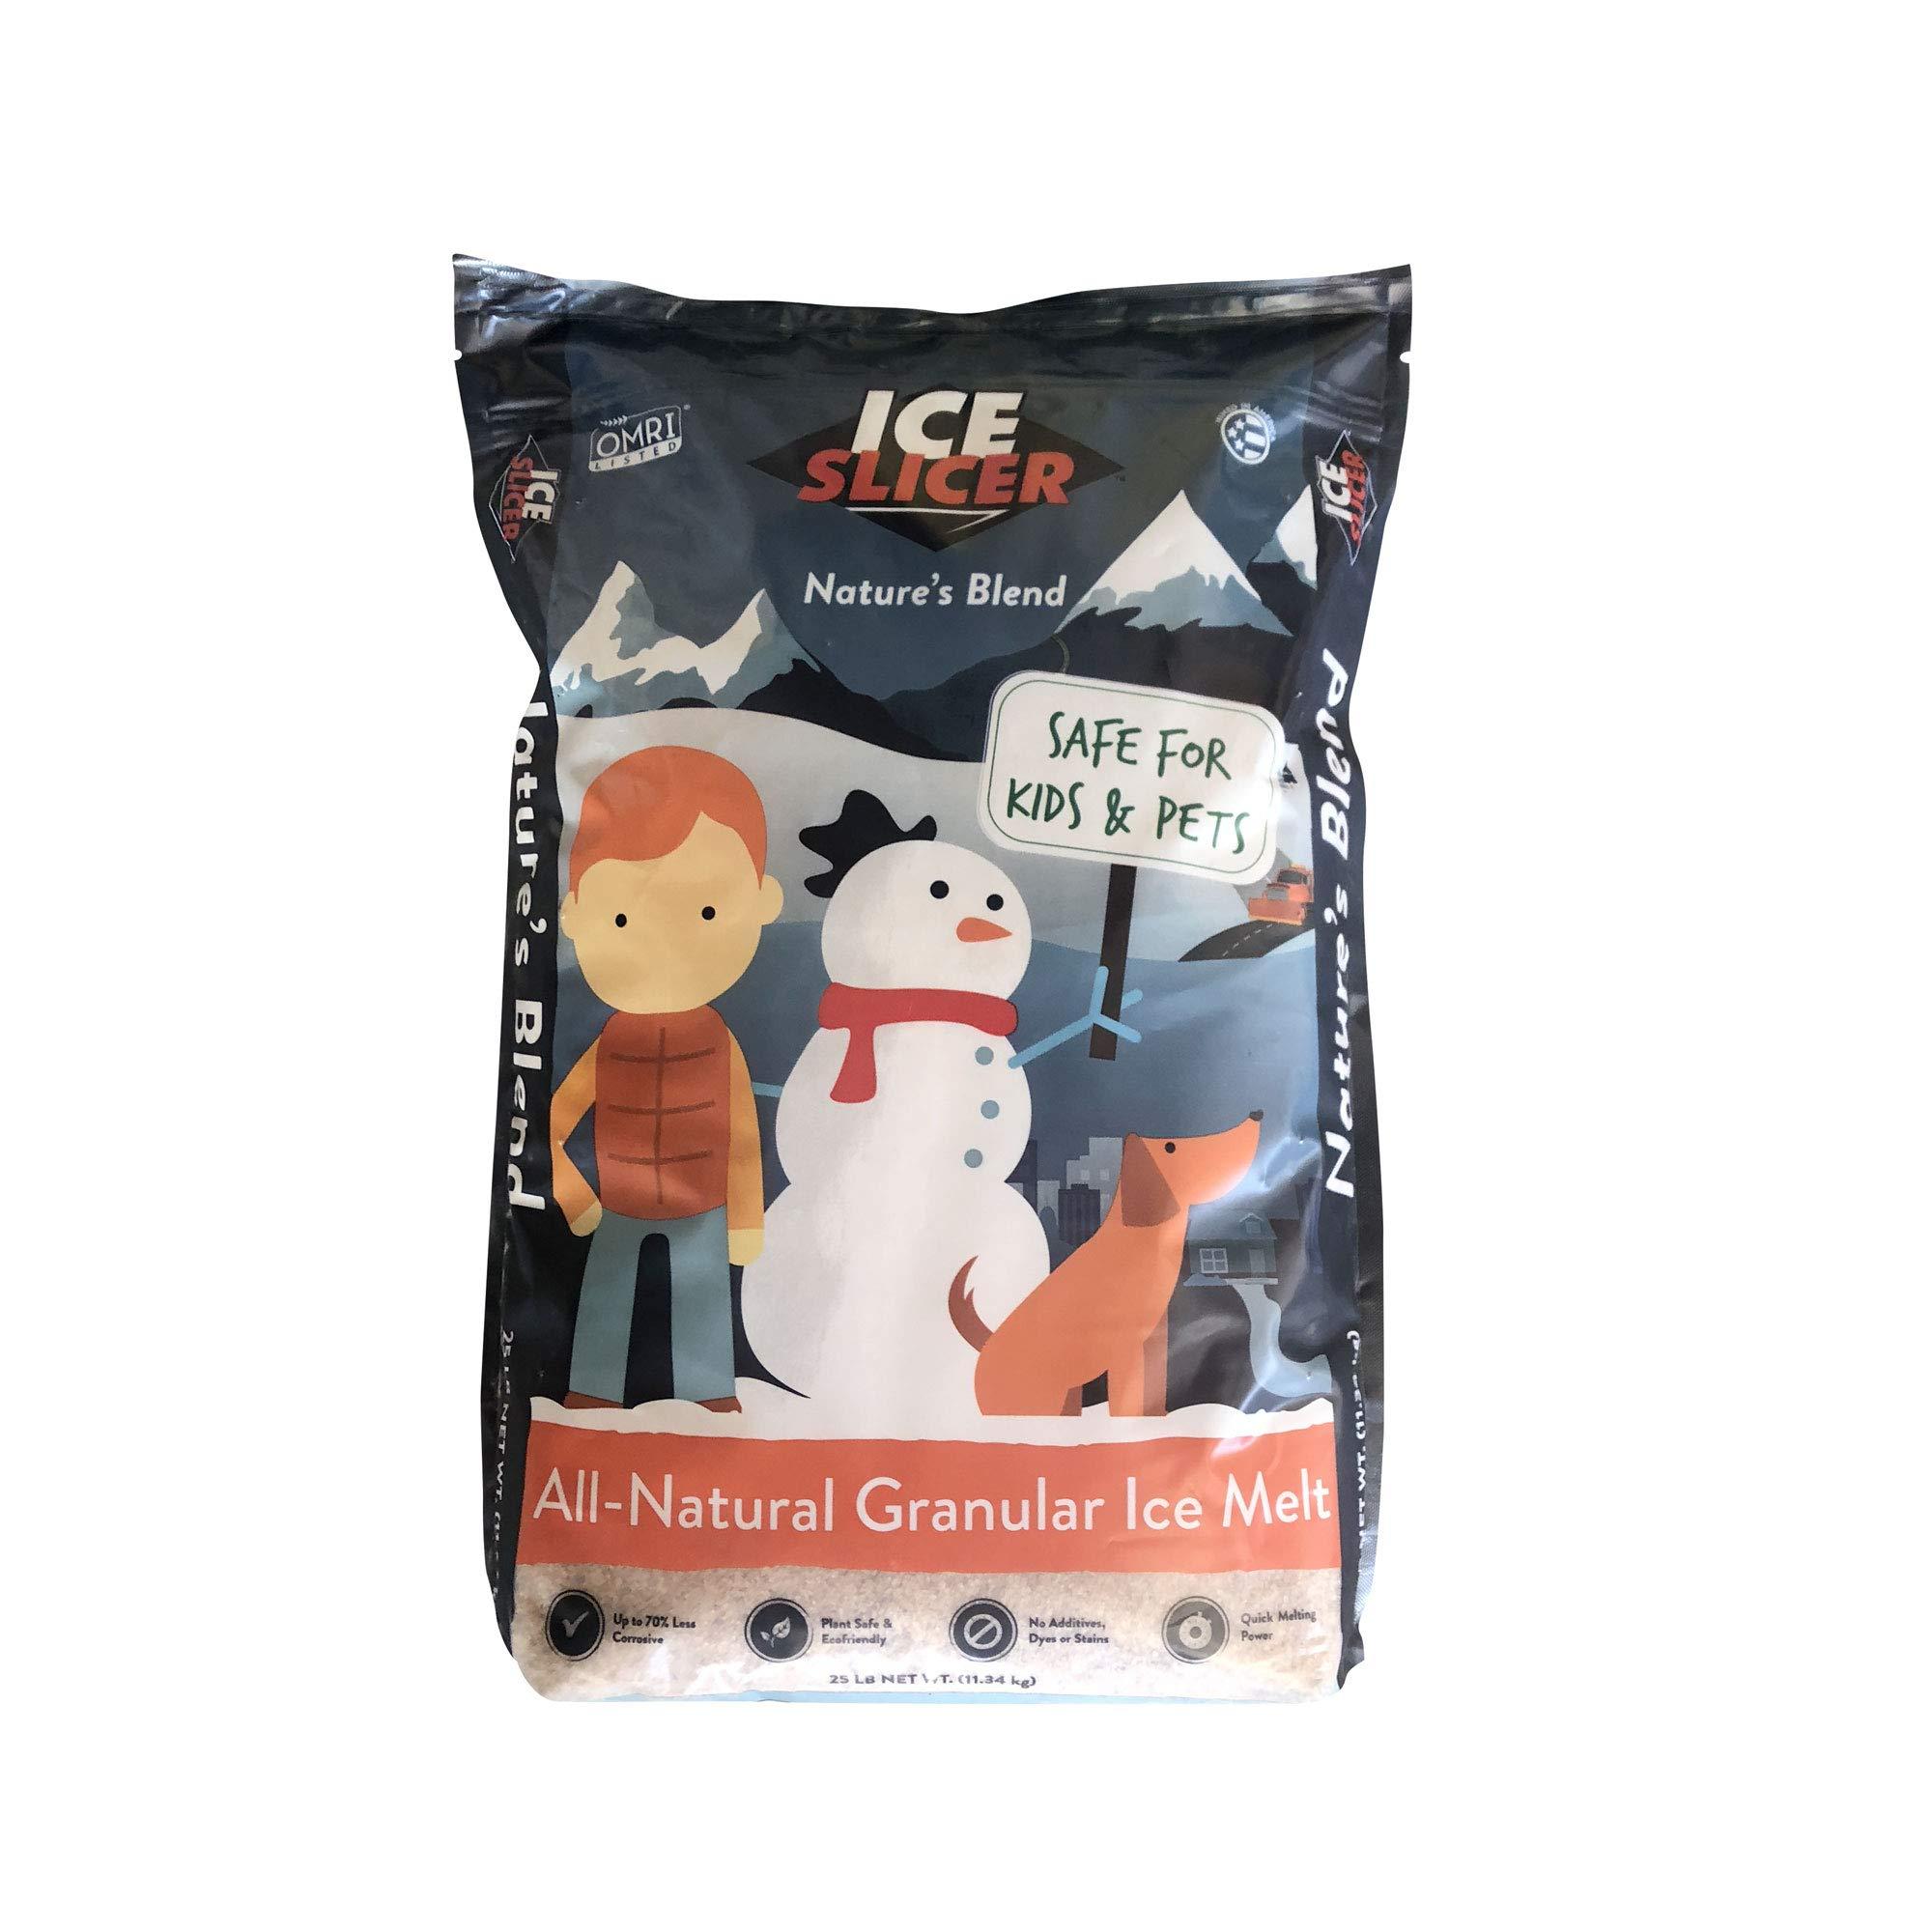 REDMOND Ice Slicer - Ice Melt Salt, Kid & Pet Safe Deicer, All-Natural Granular Ice Melt (25 LB) by REDMOND